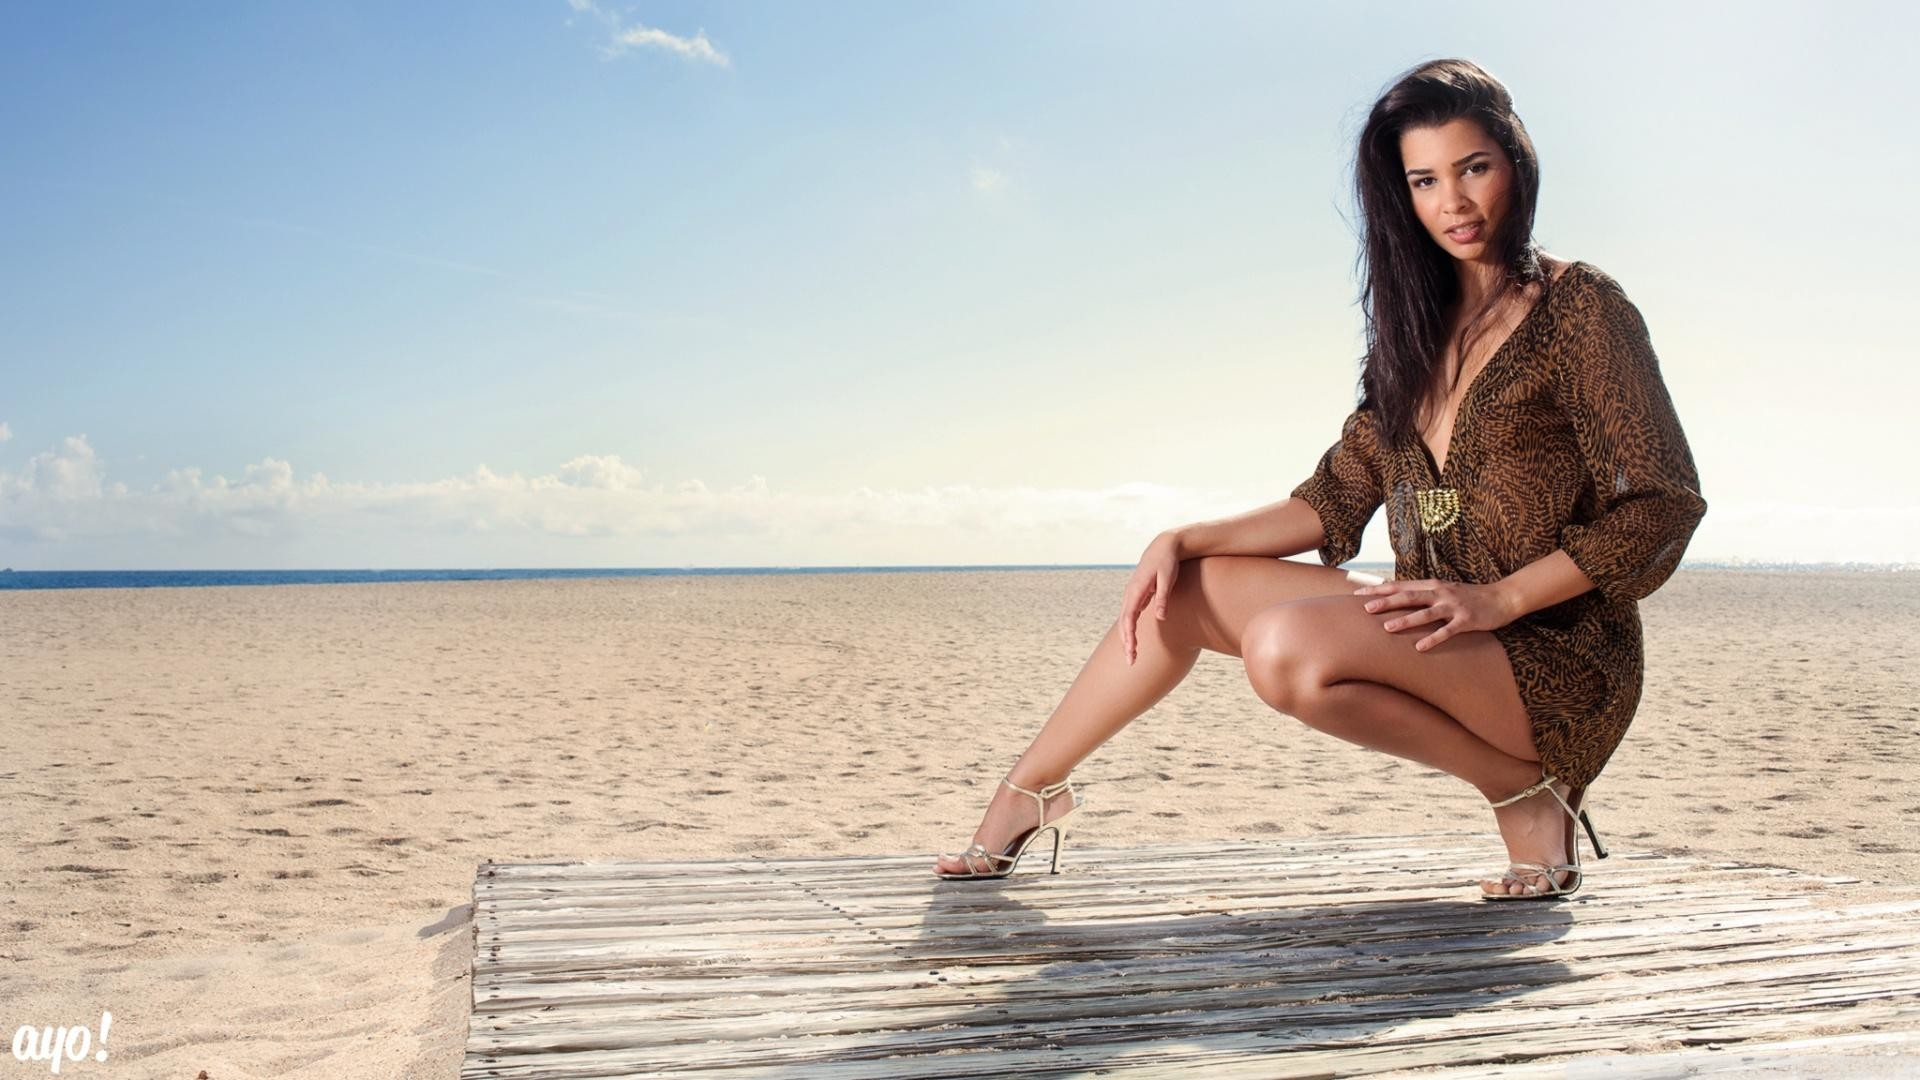 Hot Beach Girl Pictures HD Wallpaper